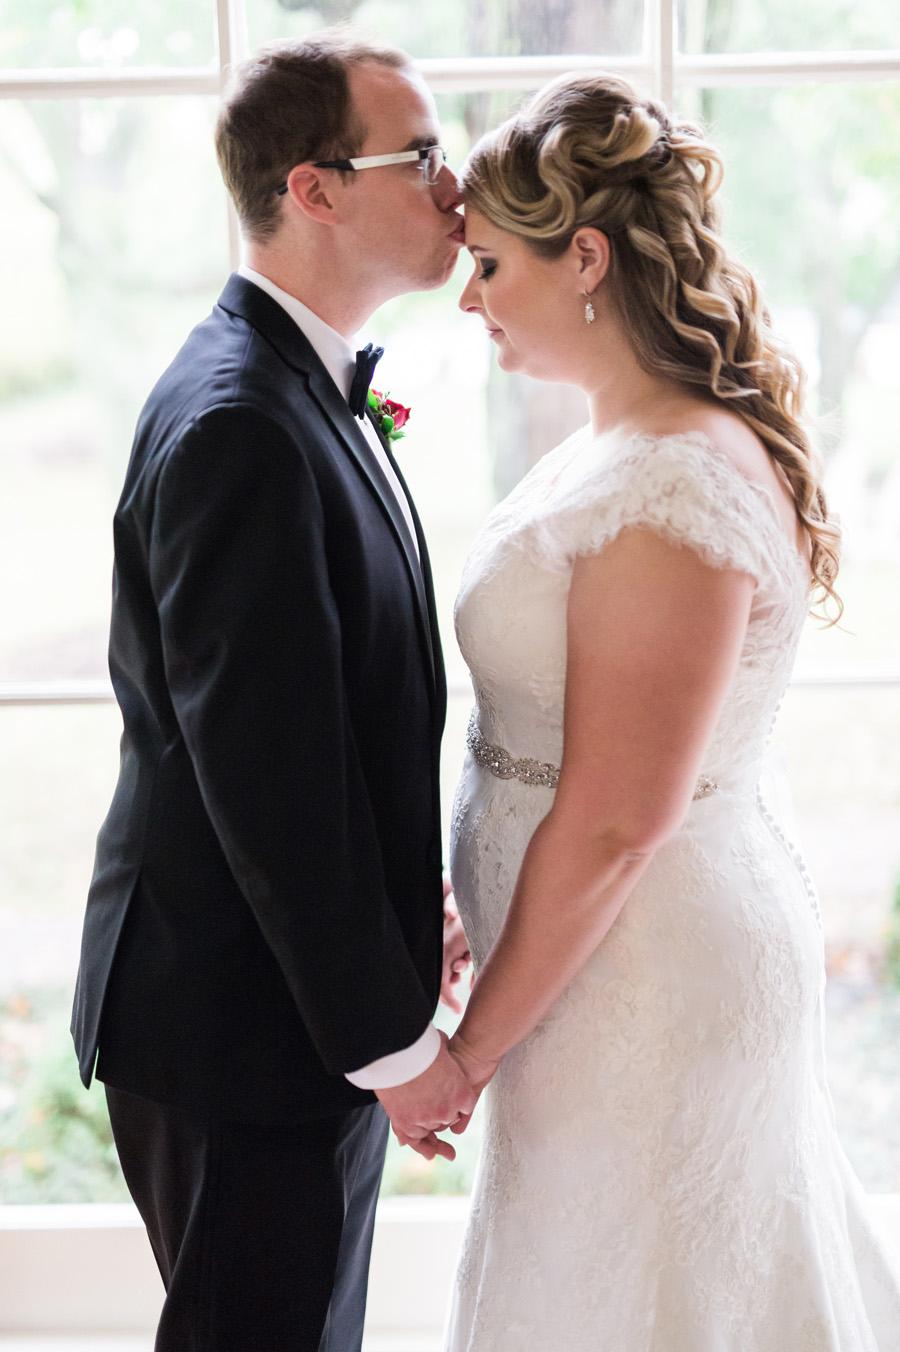 Groom kisses bride on her forehead.